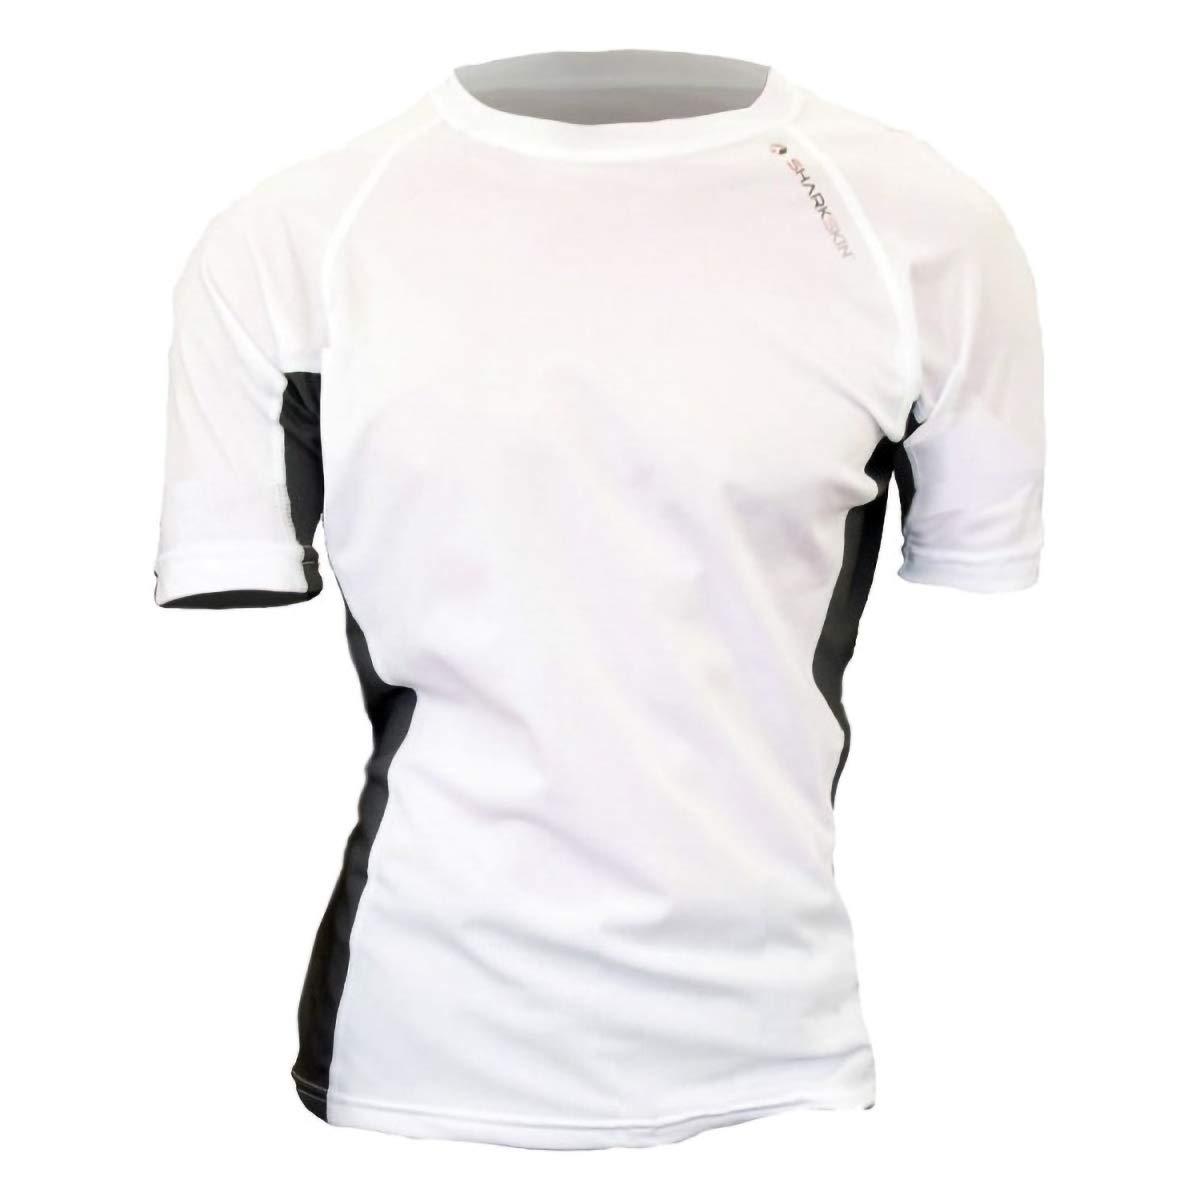 Sharkskin Rapid Dry Short Sleeve Shirt, White, Medium by Sharkskin